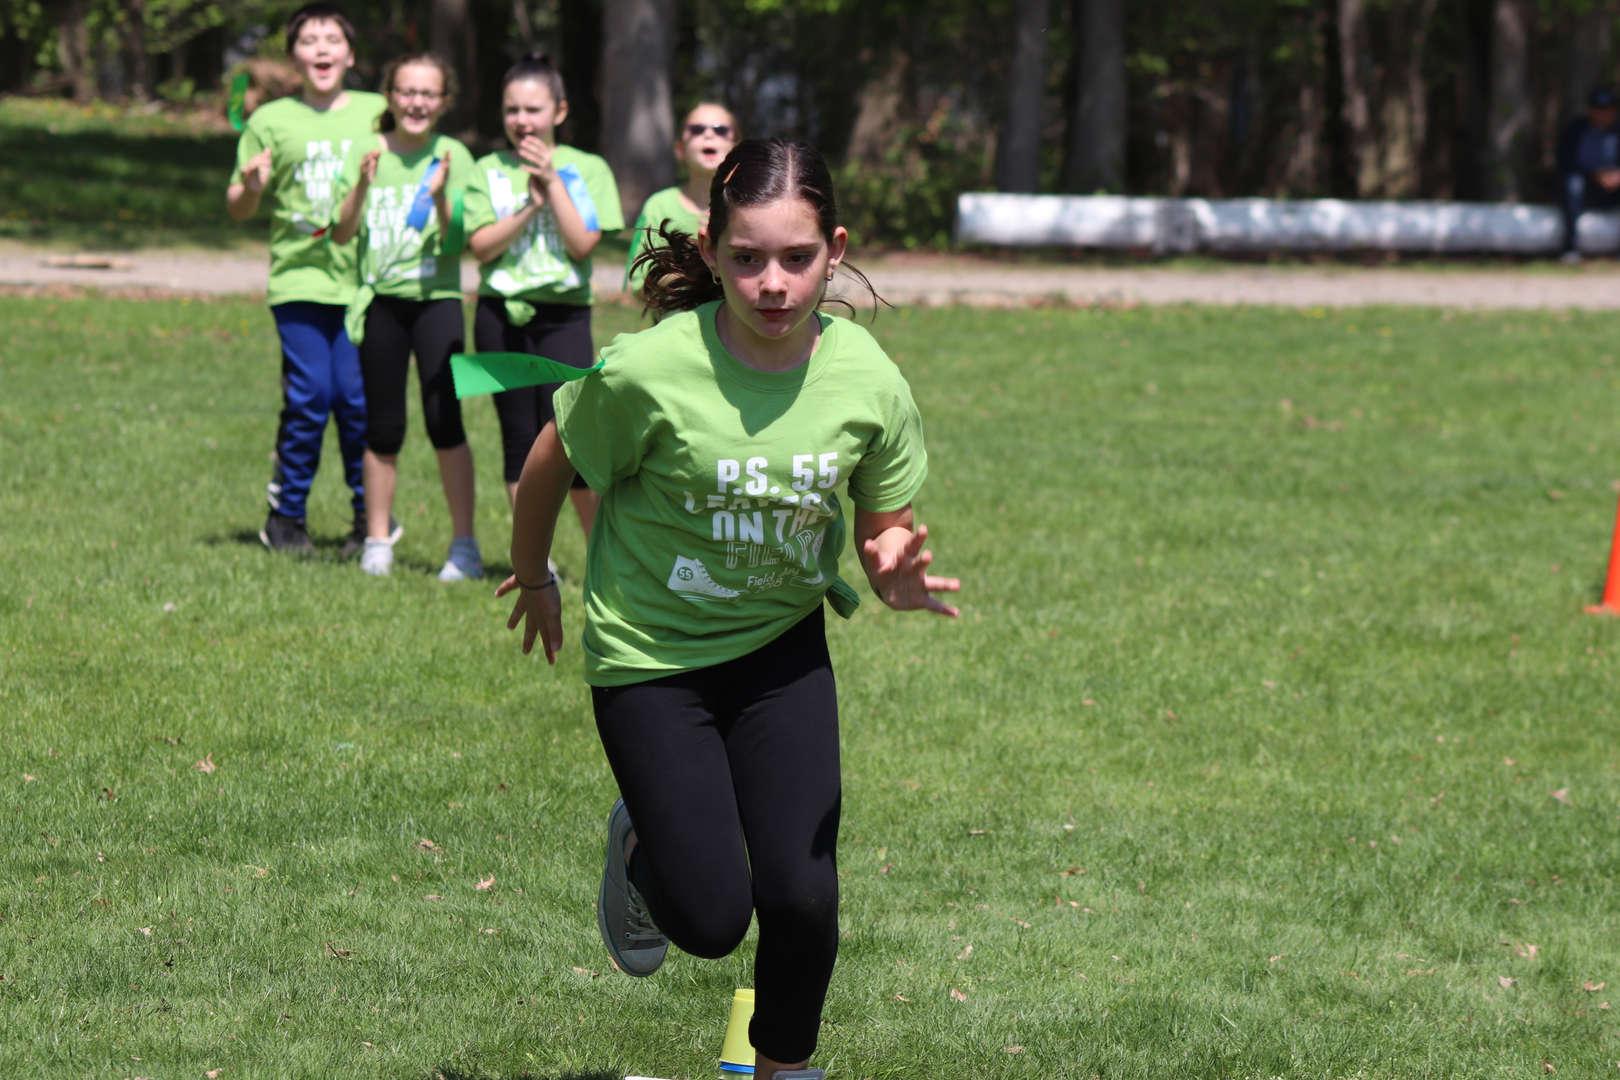 girl is running in her race